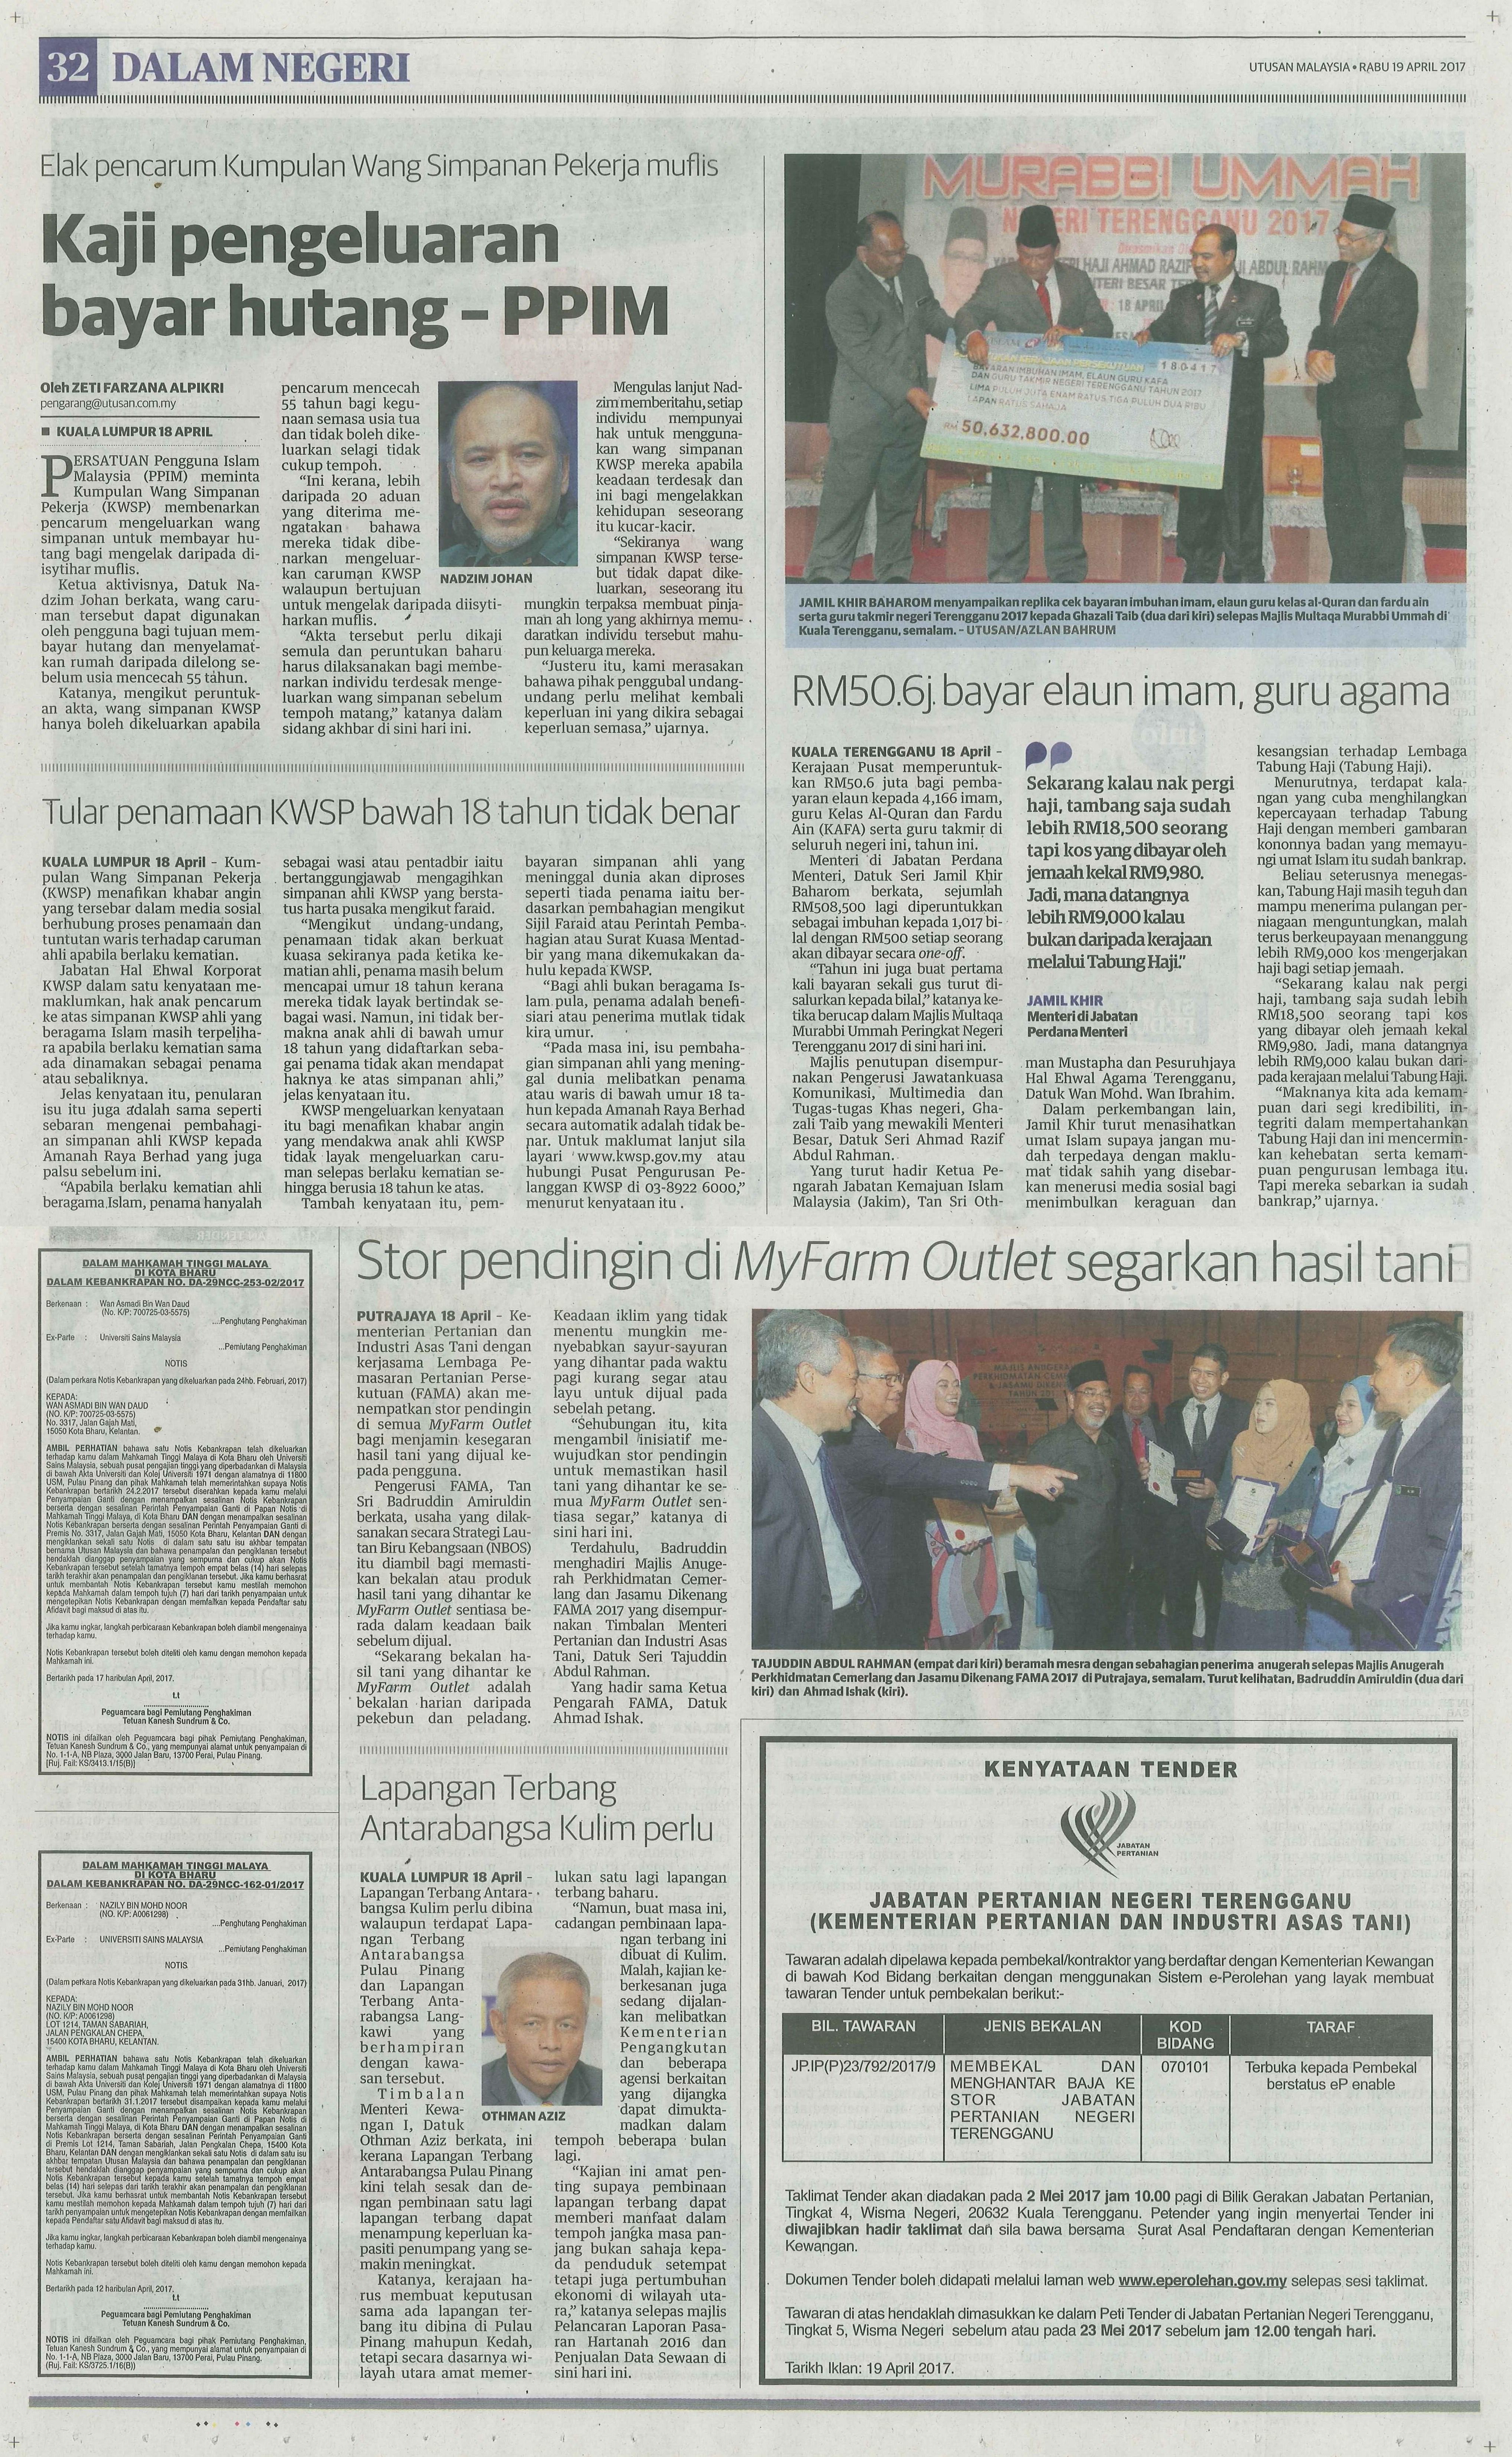 utusan malaysia 19.4.2017